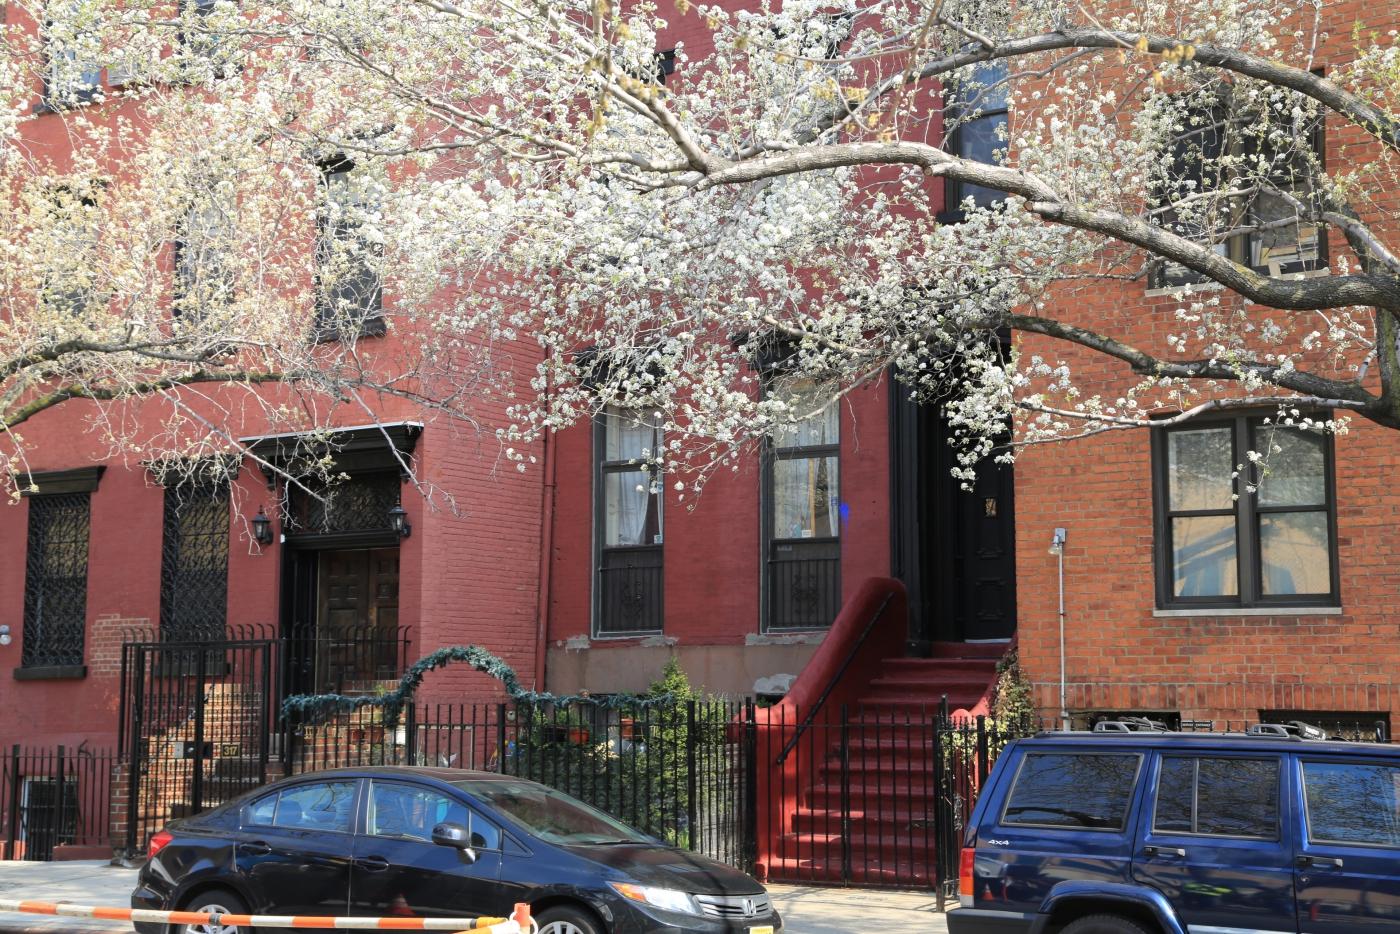 Spring NYC 街拍_图1-9